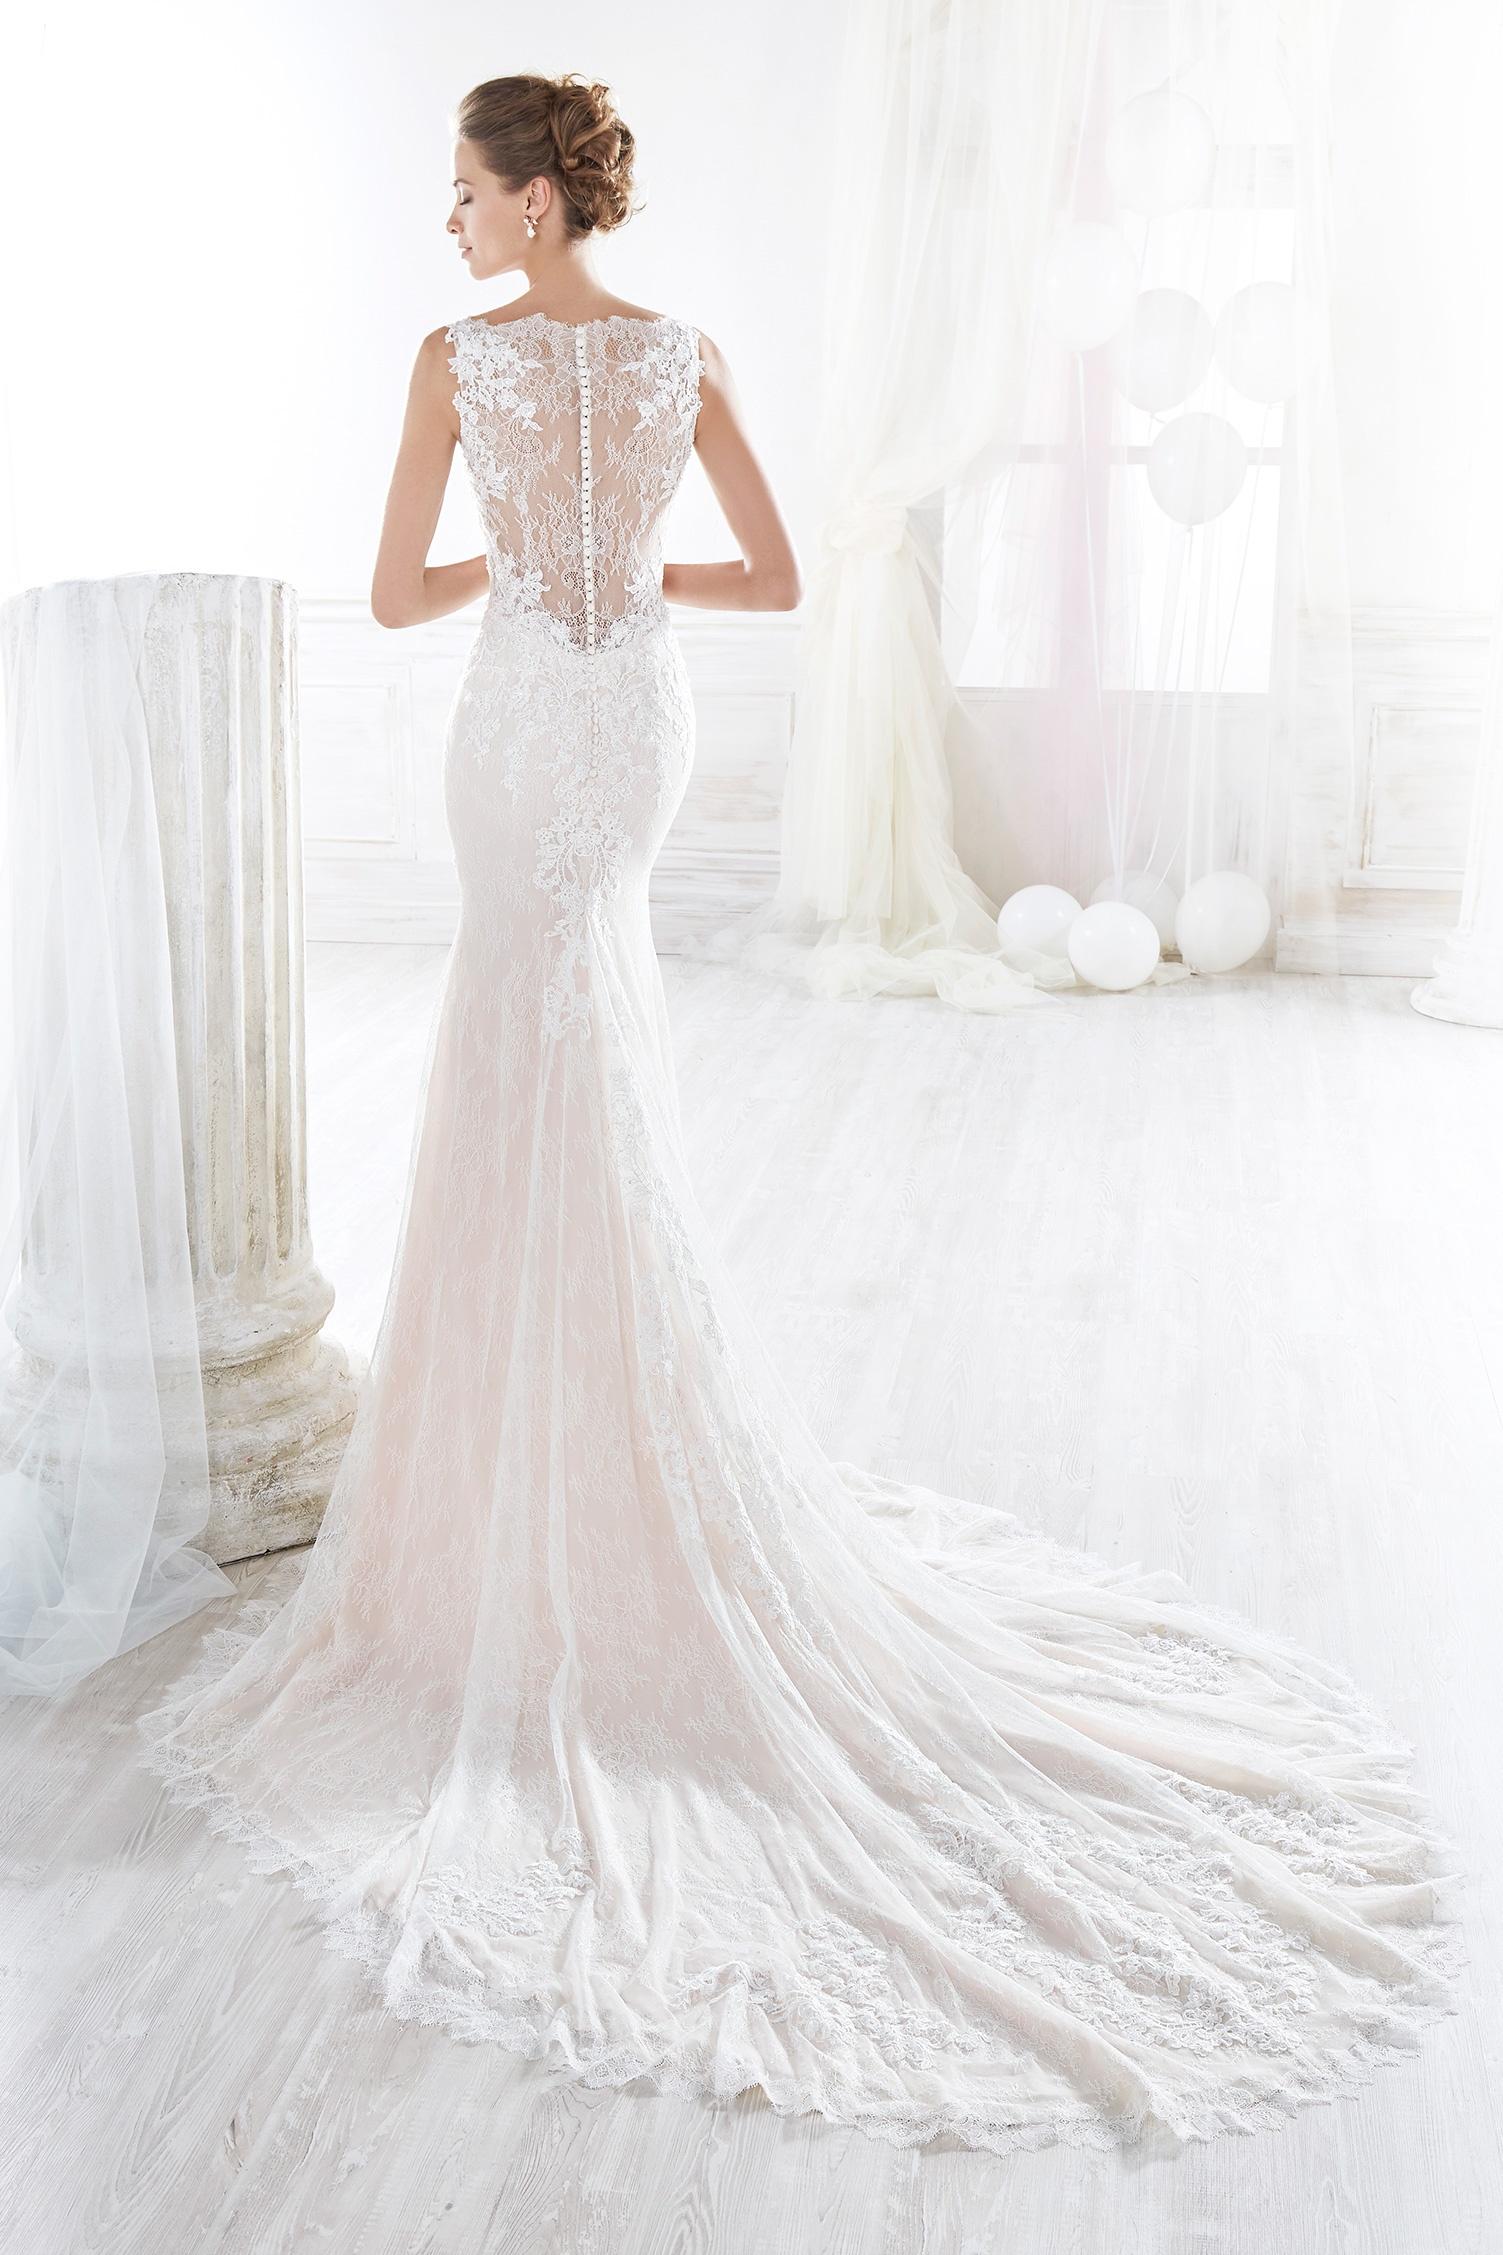 9c4454d4ece83 nicole-spose-NIAB18001-Nicole-moda-sposa-2018-795 - LA Bridal House